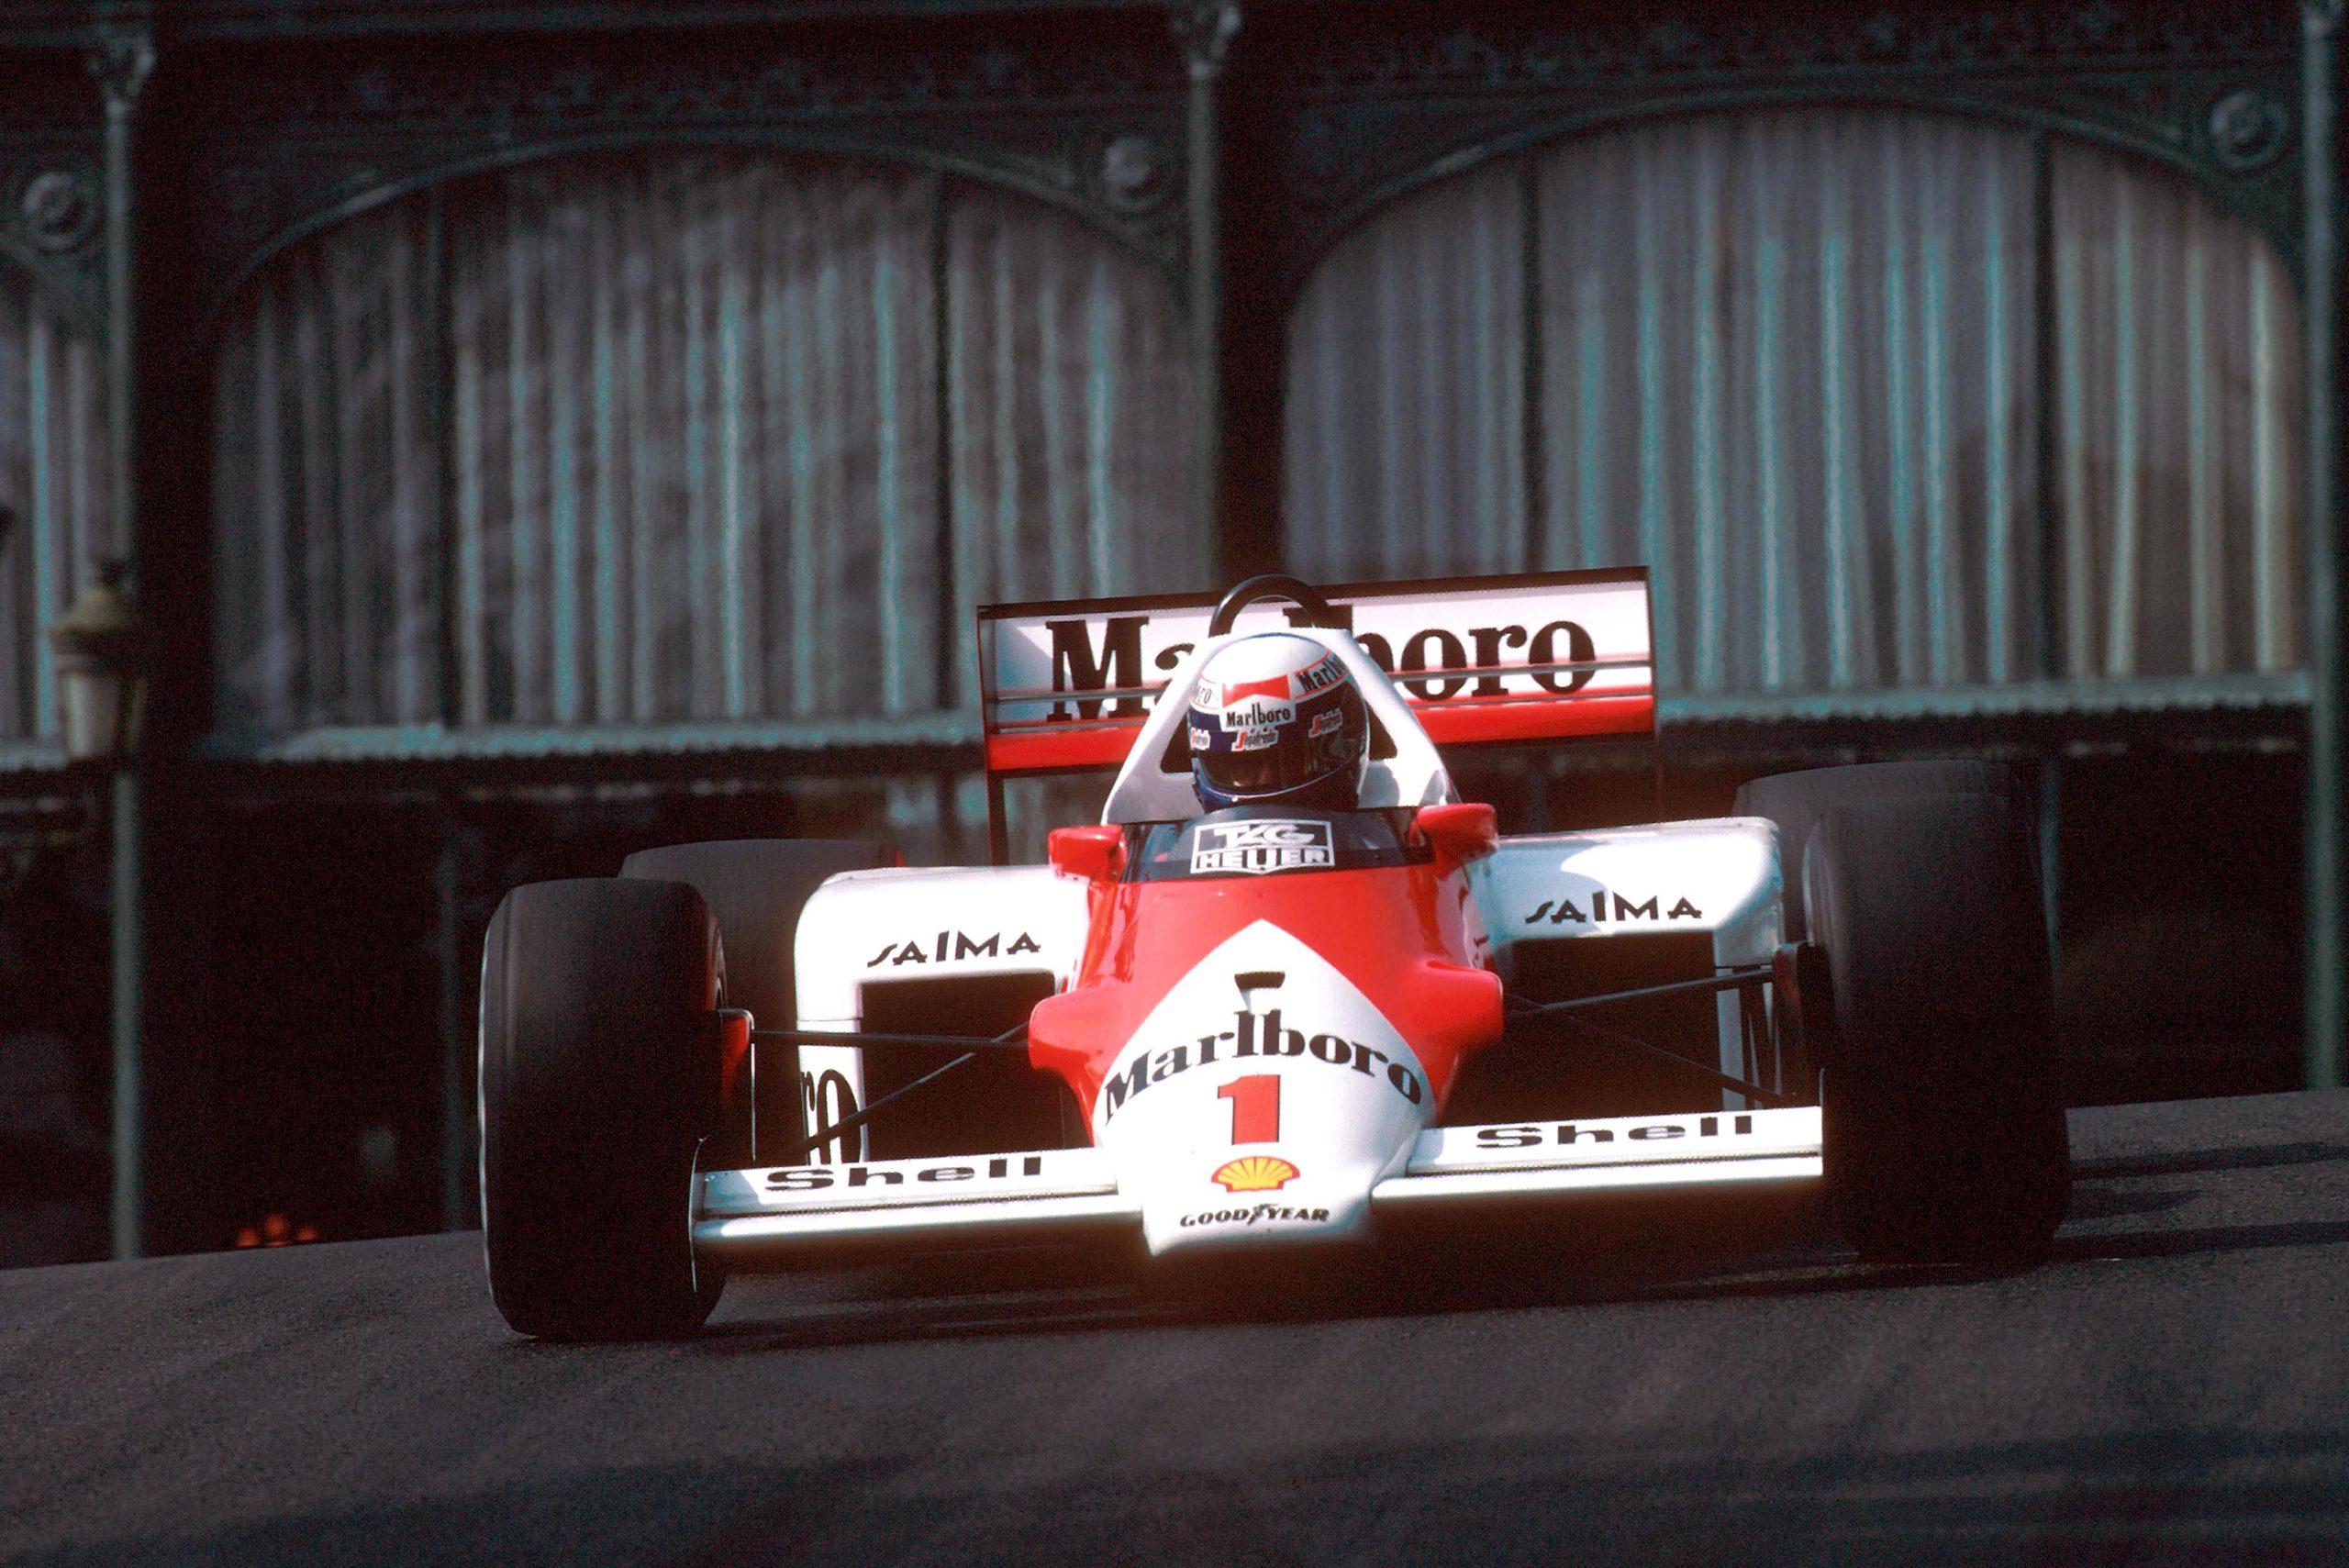 McLaren's Alain Prost took his third consecutive Monaco win